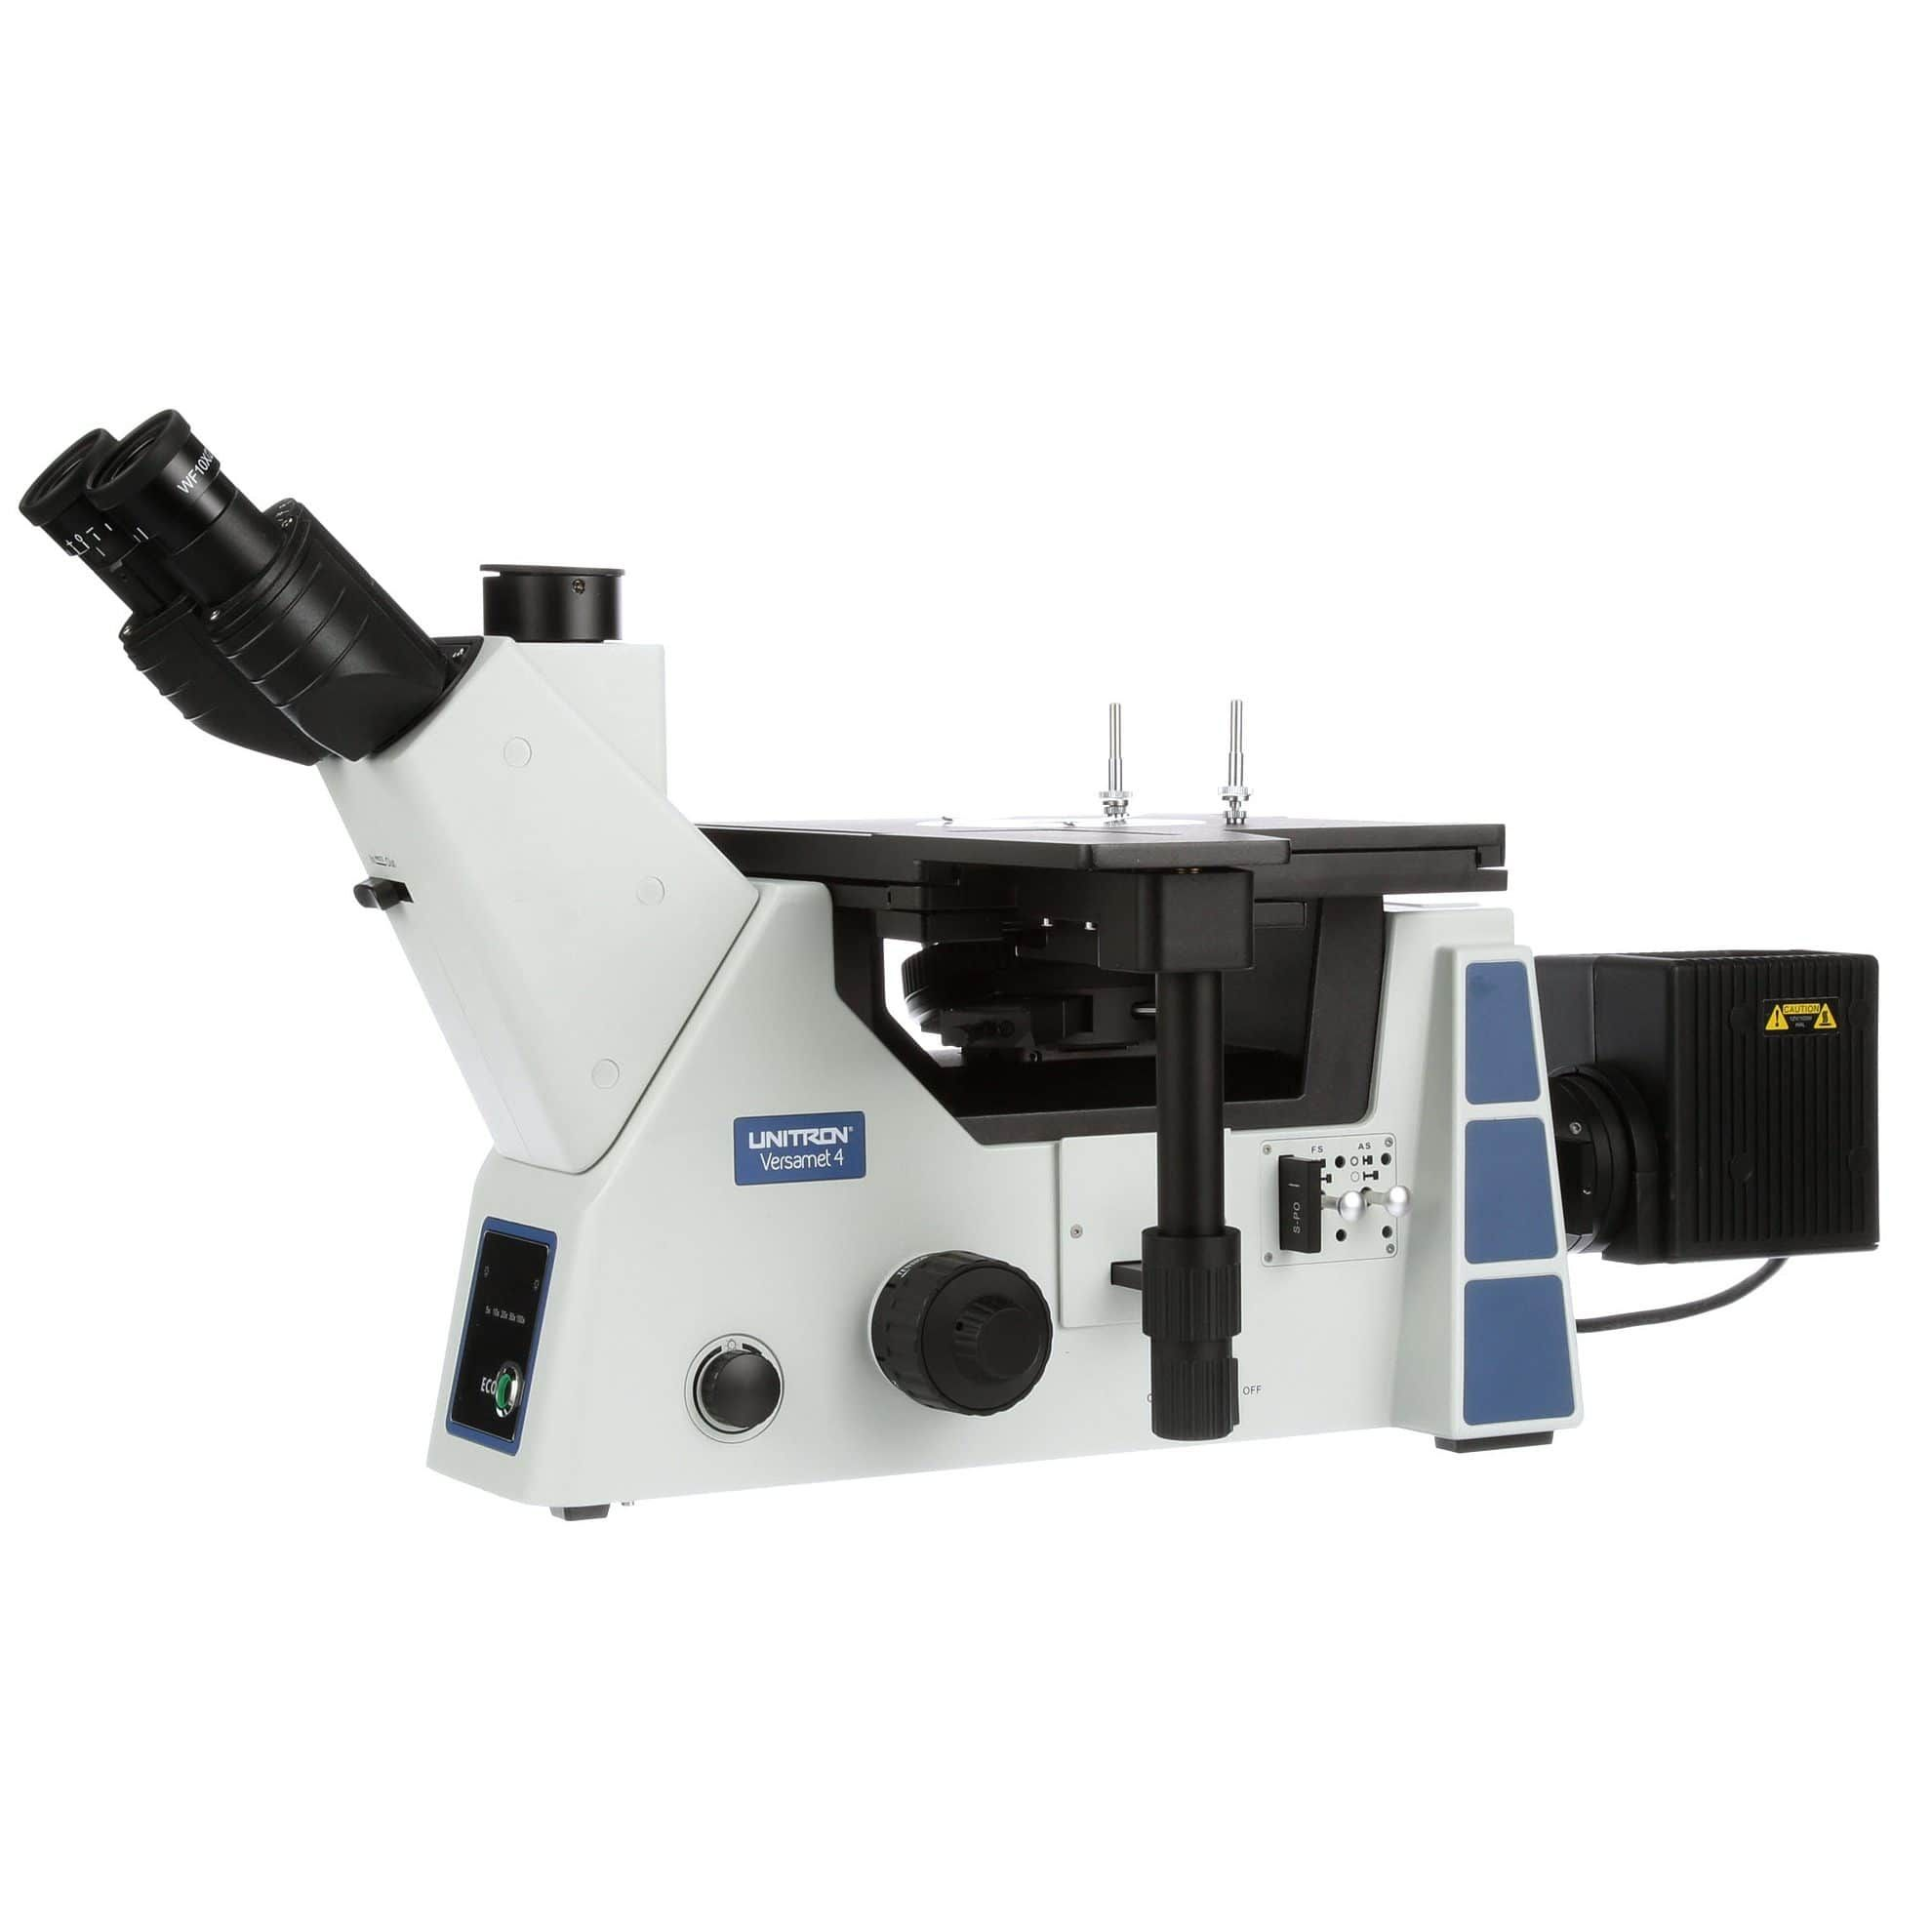 Unitron Versamet 4 Trinocular Inverted Metallurgical Microscope